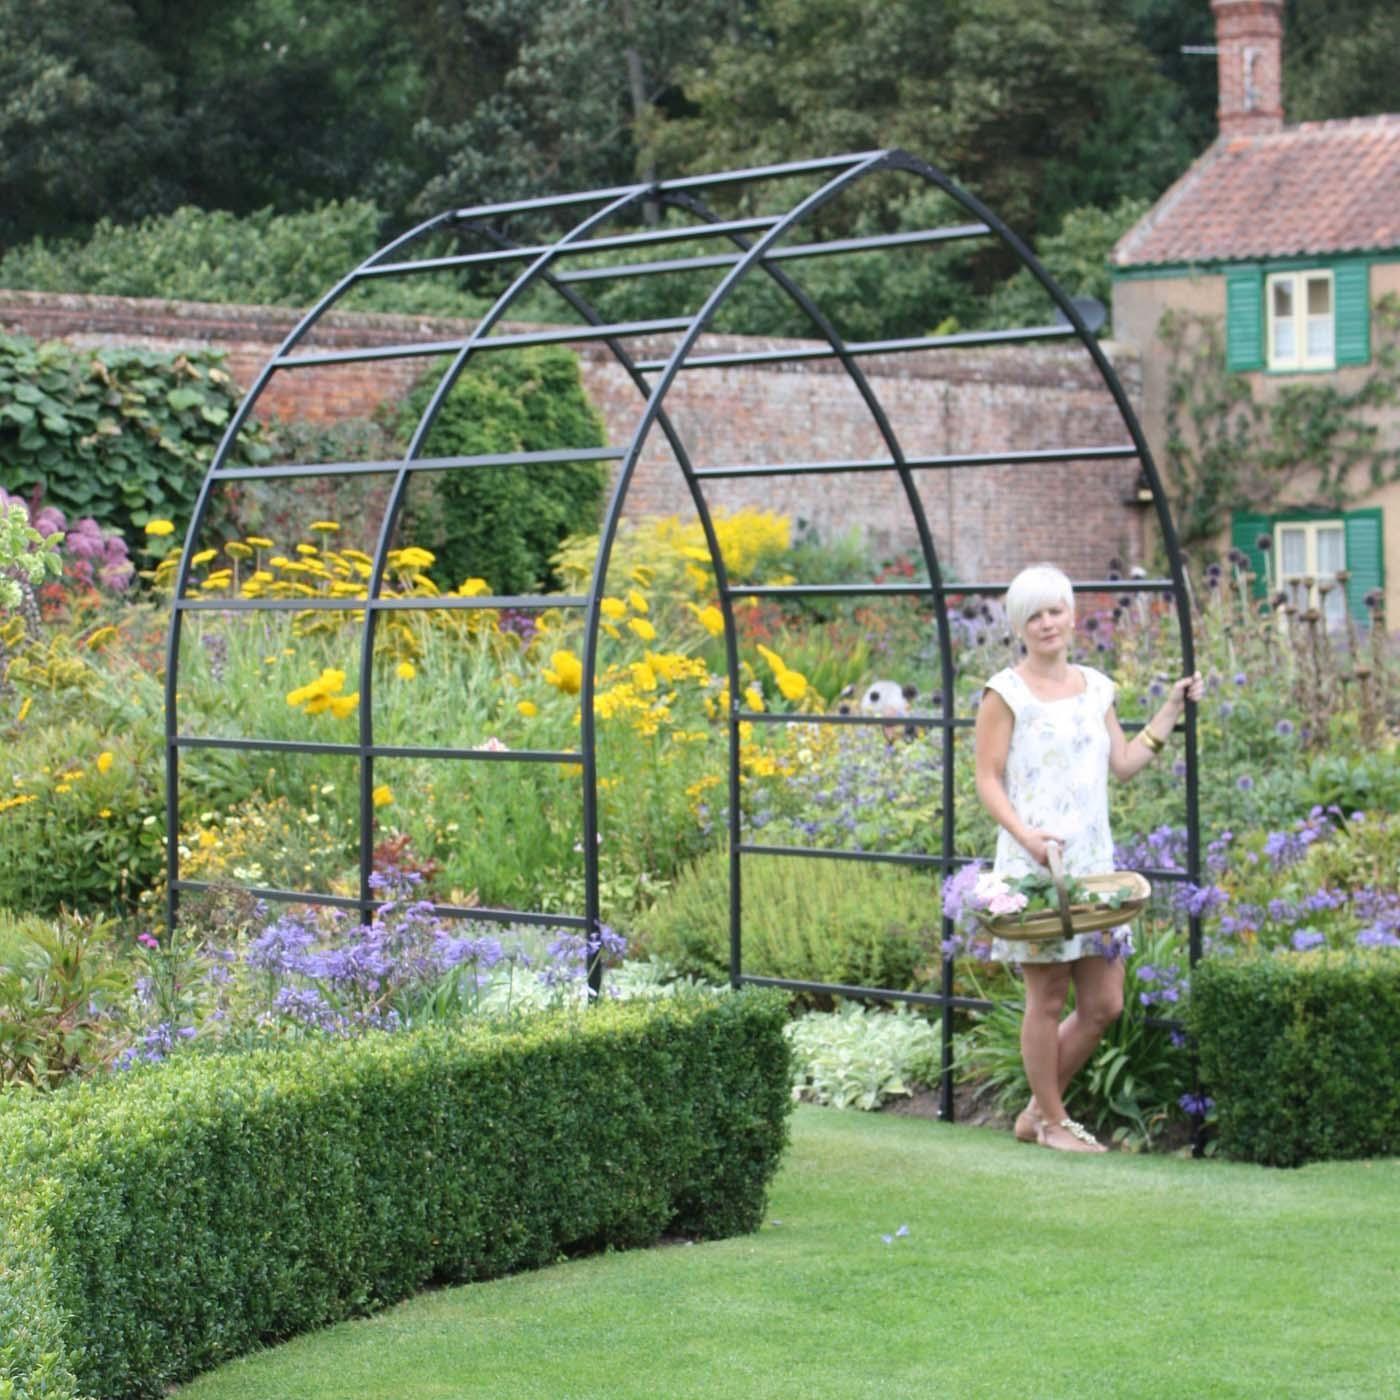 Gothic Arch Metal Garden Pergola Harrod Horticultural Uk - Metal Garden Arches And Pergolas - Garden Inspiration